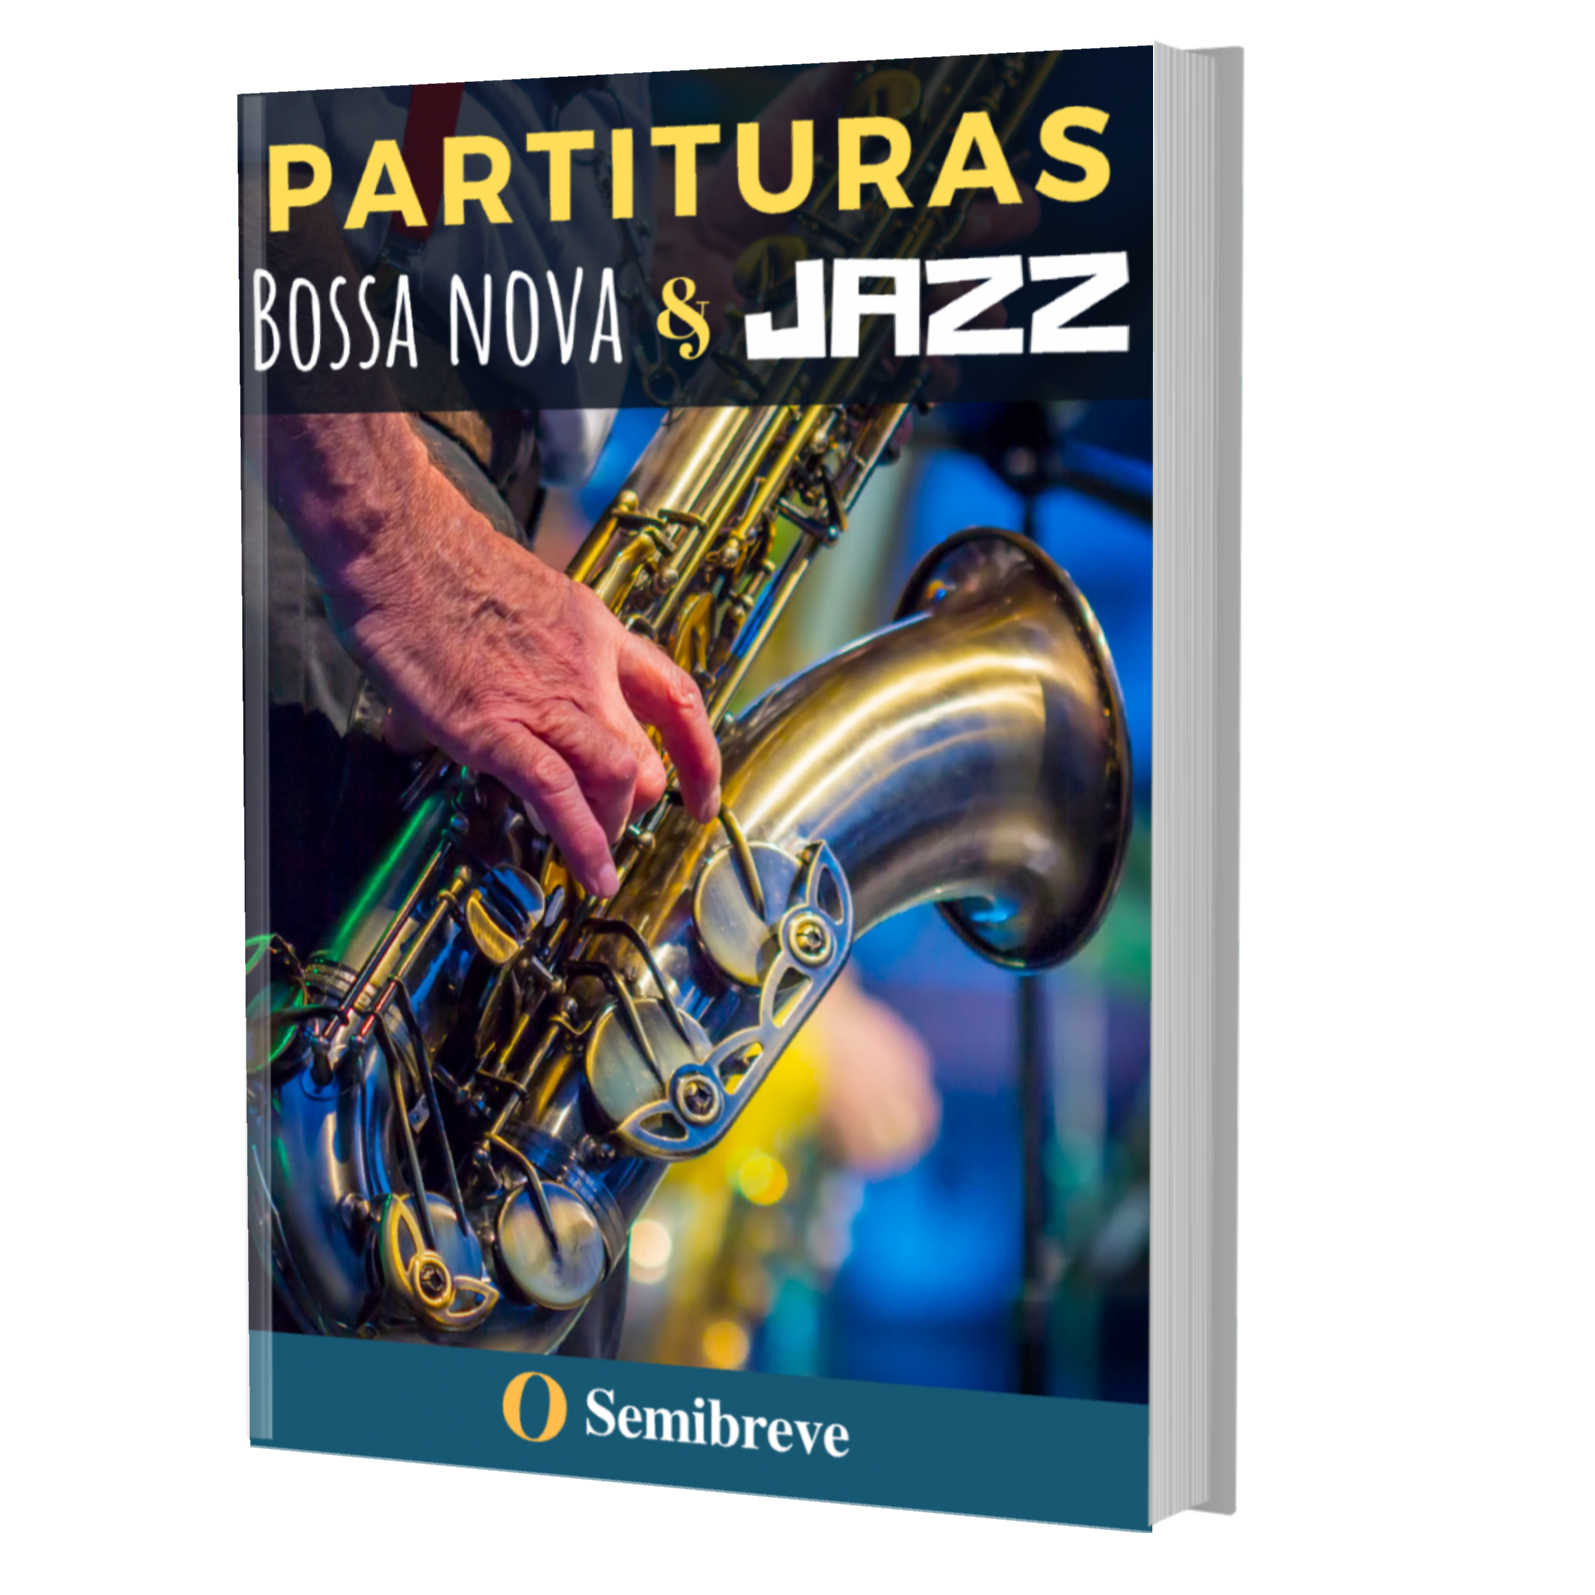 Partituras Sax Gratis Semibreve Online Download Partituras Sax